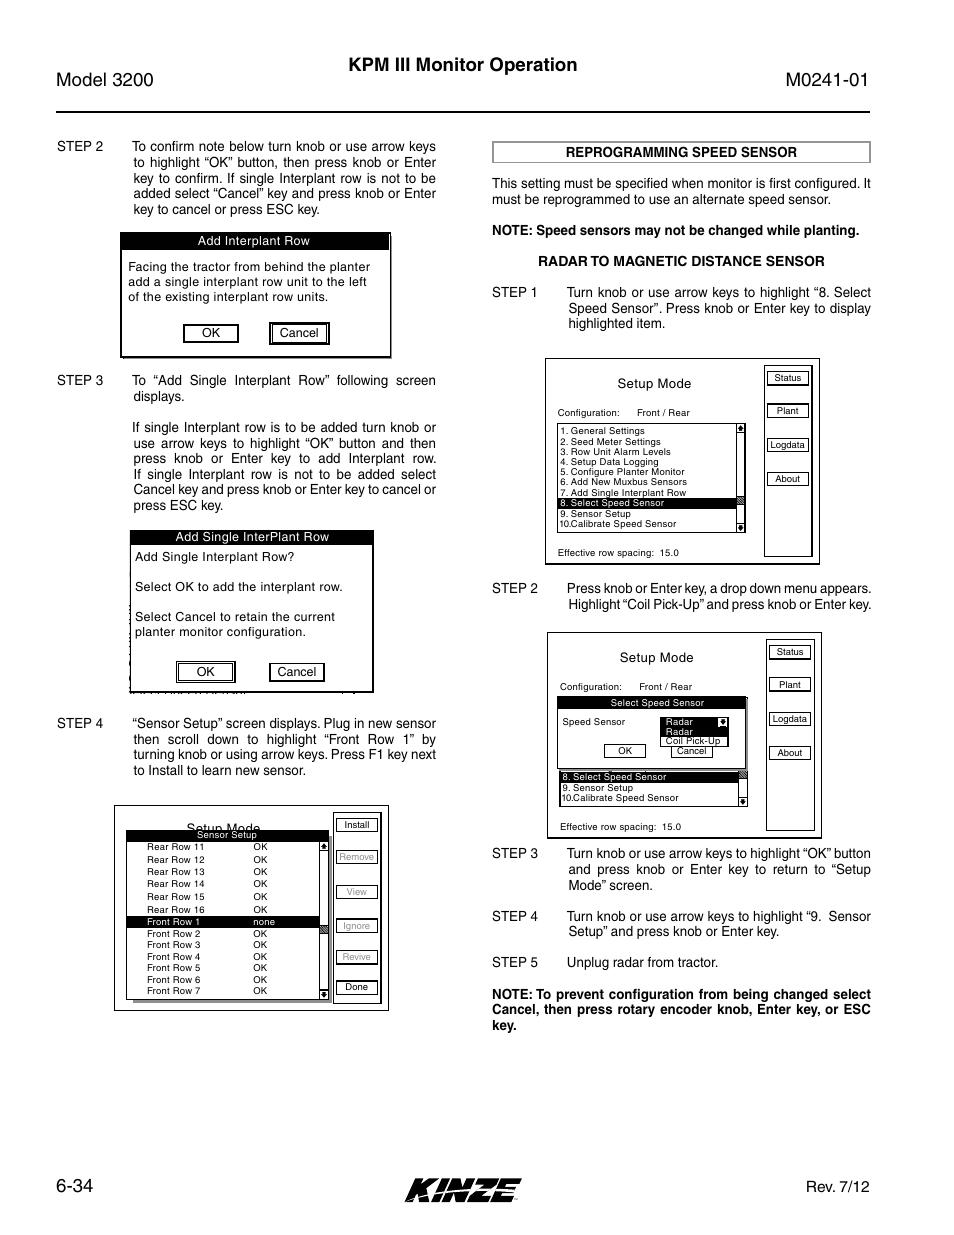 Reprogramming speed sensor -34, Kpm iii monitor operation, Setup mode |  Kinze 3200